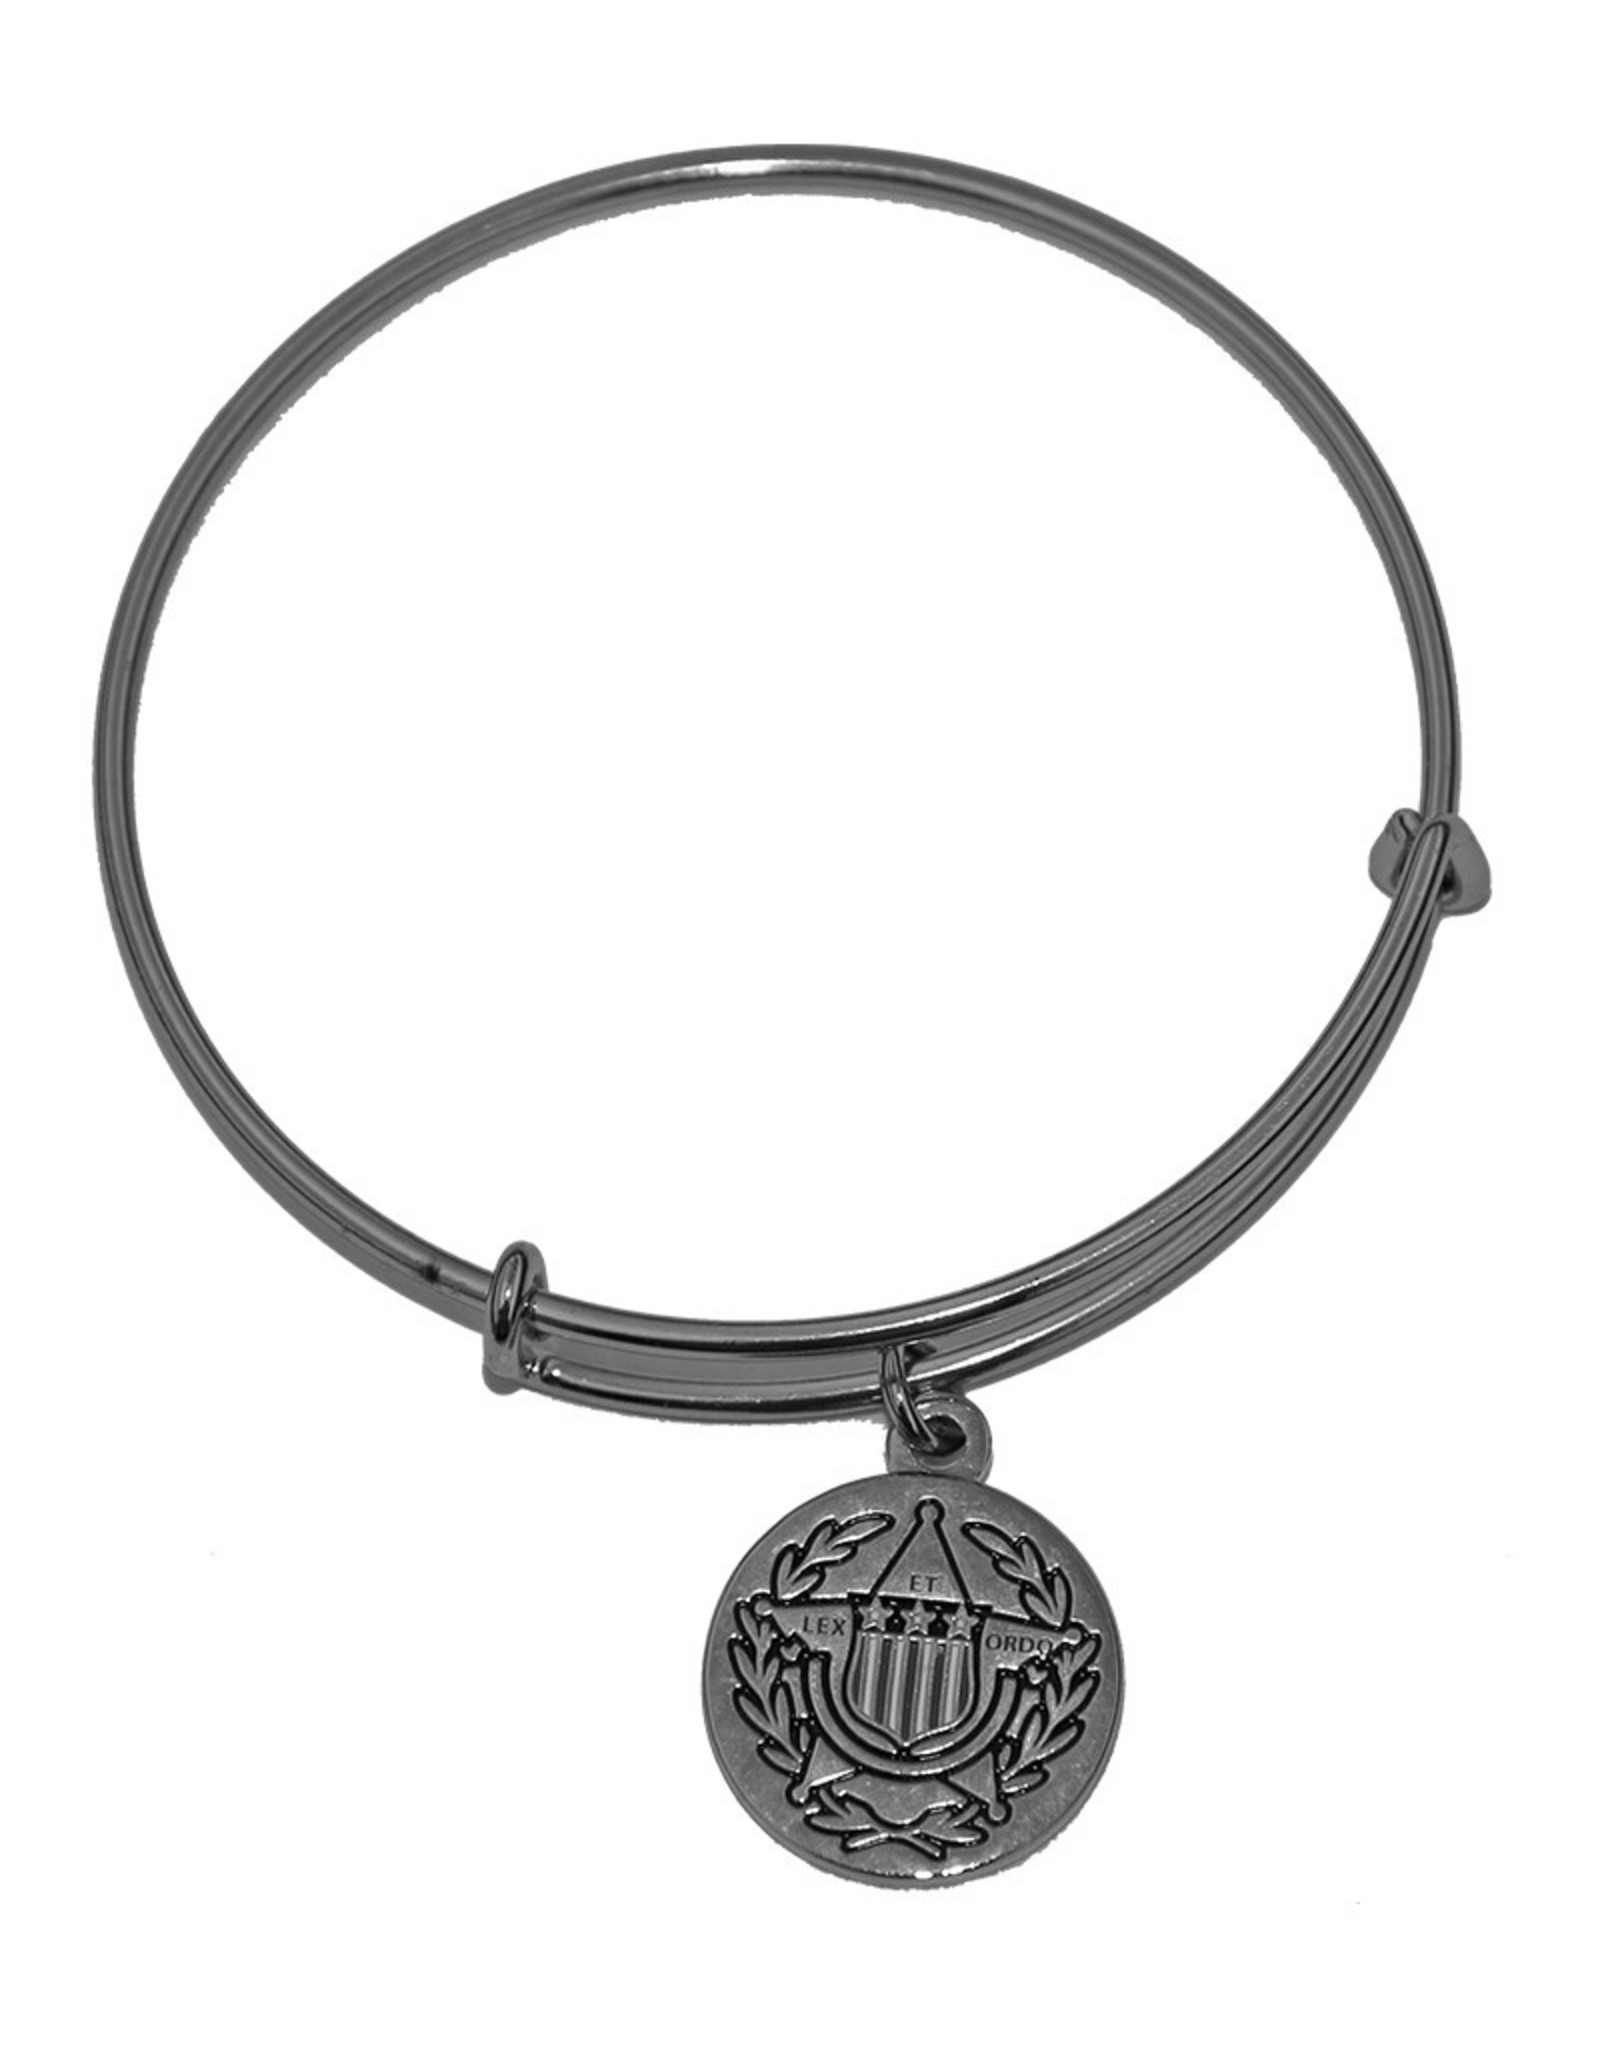 APHF Silver Bracelet